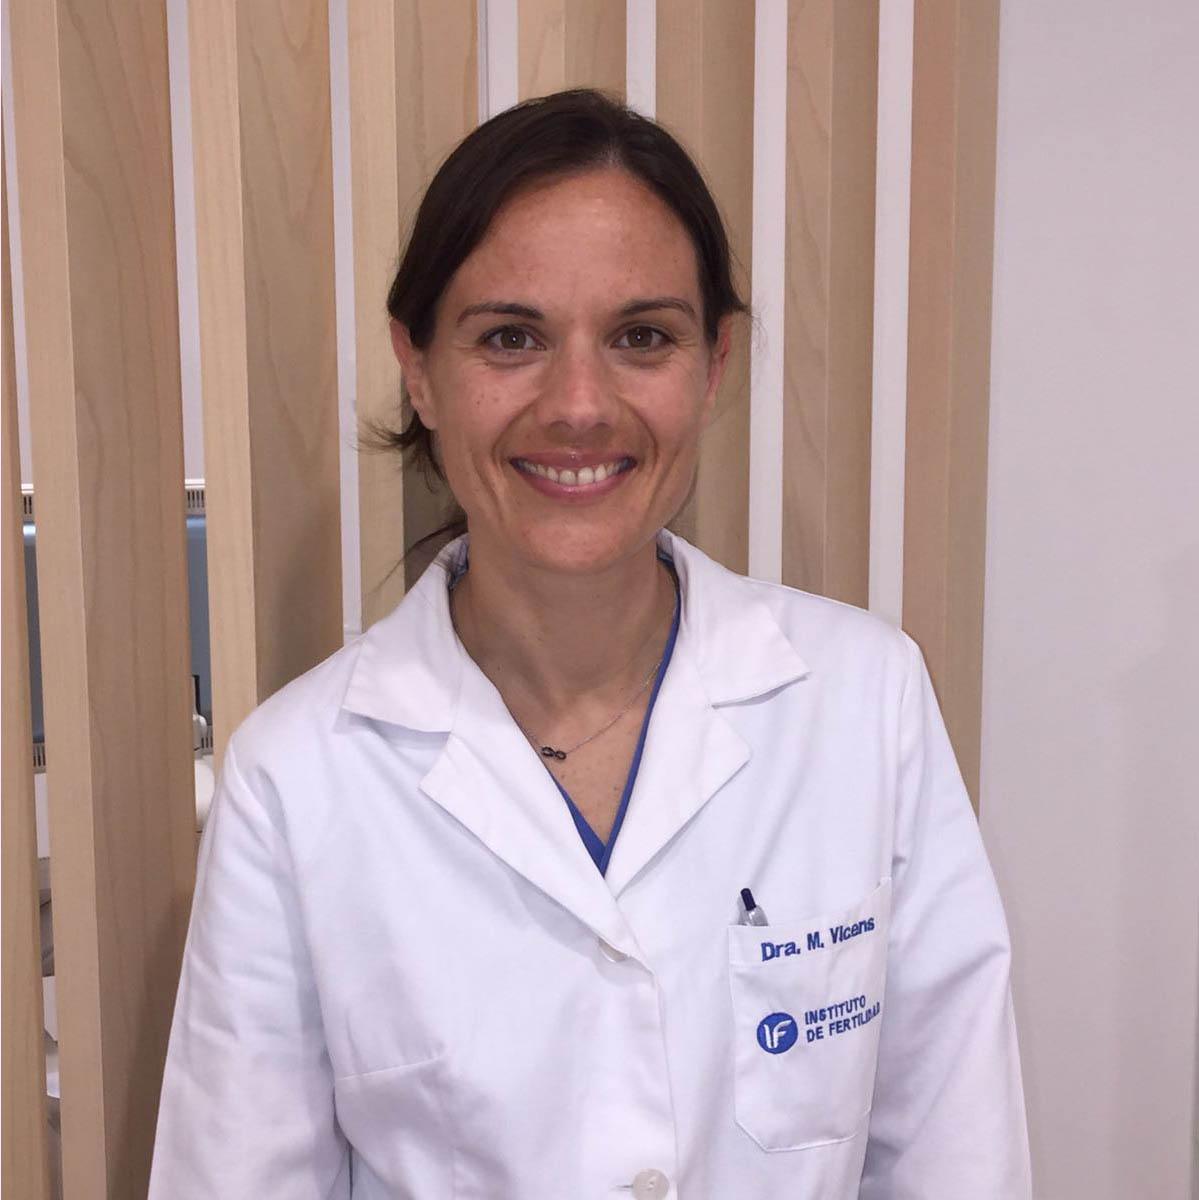 Dra. Margalida Vicens Vidal